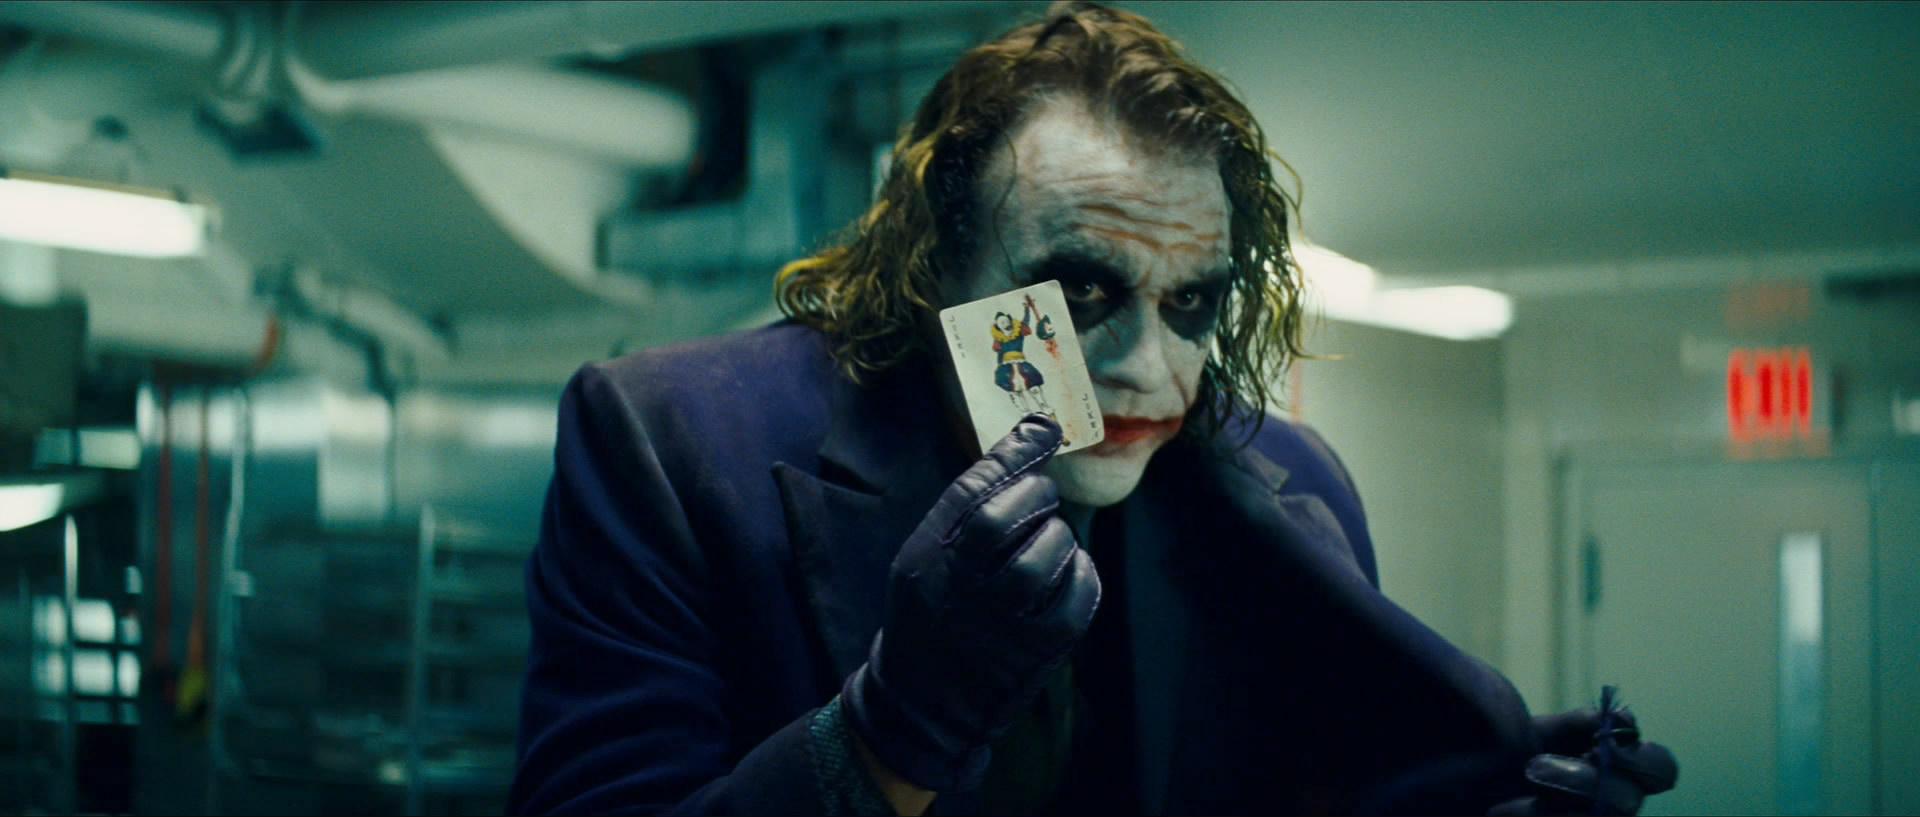 batman the joker dark - photo #25